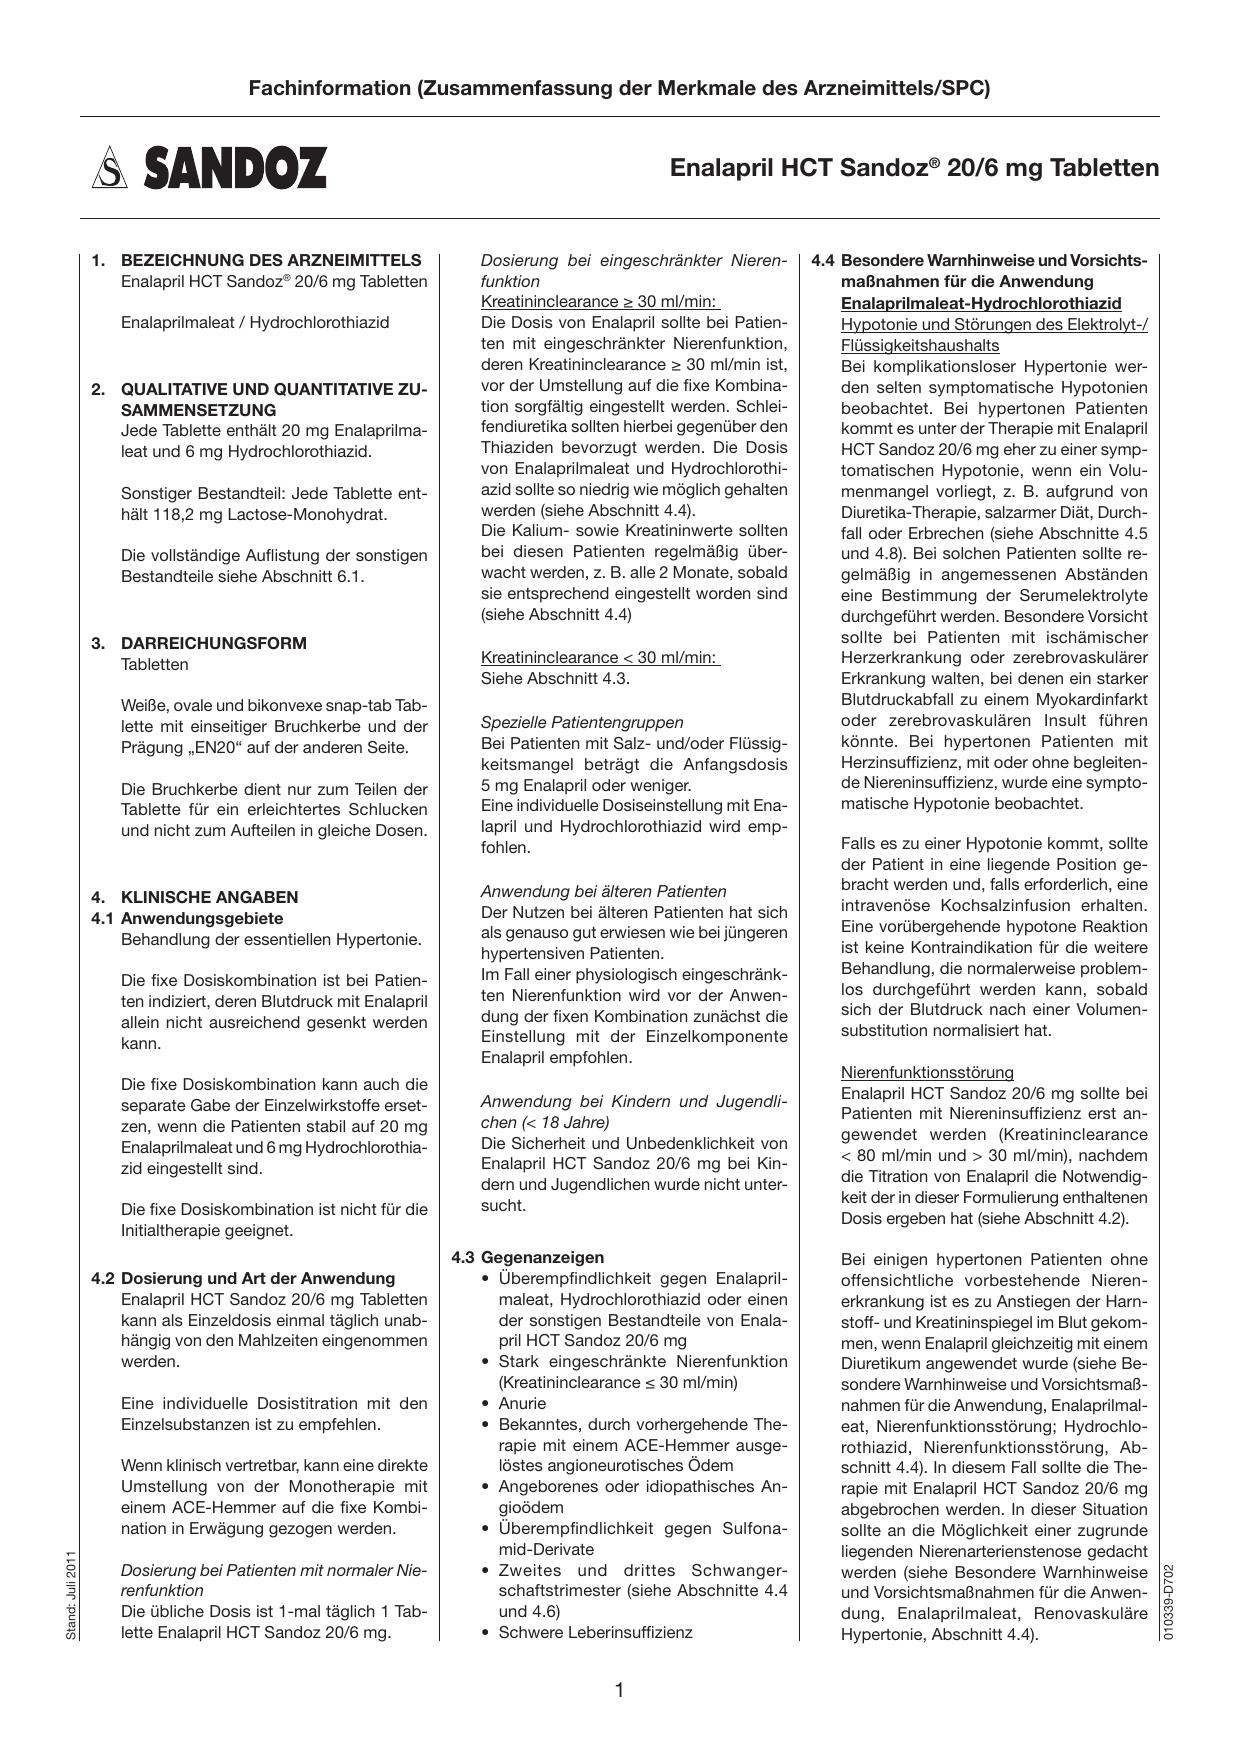 Enalapril HCT Sandoz® 20/6 mg Tabletten